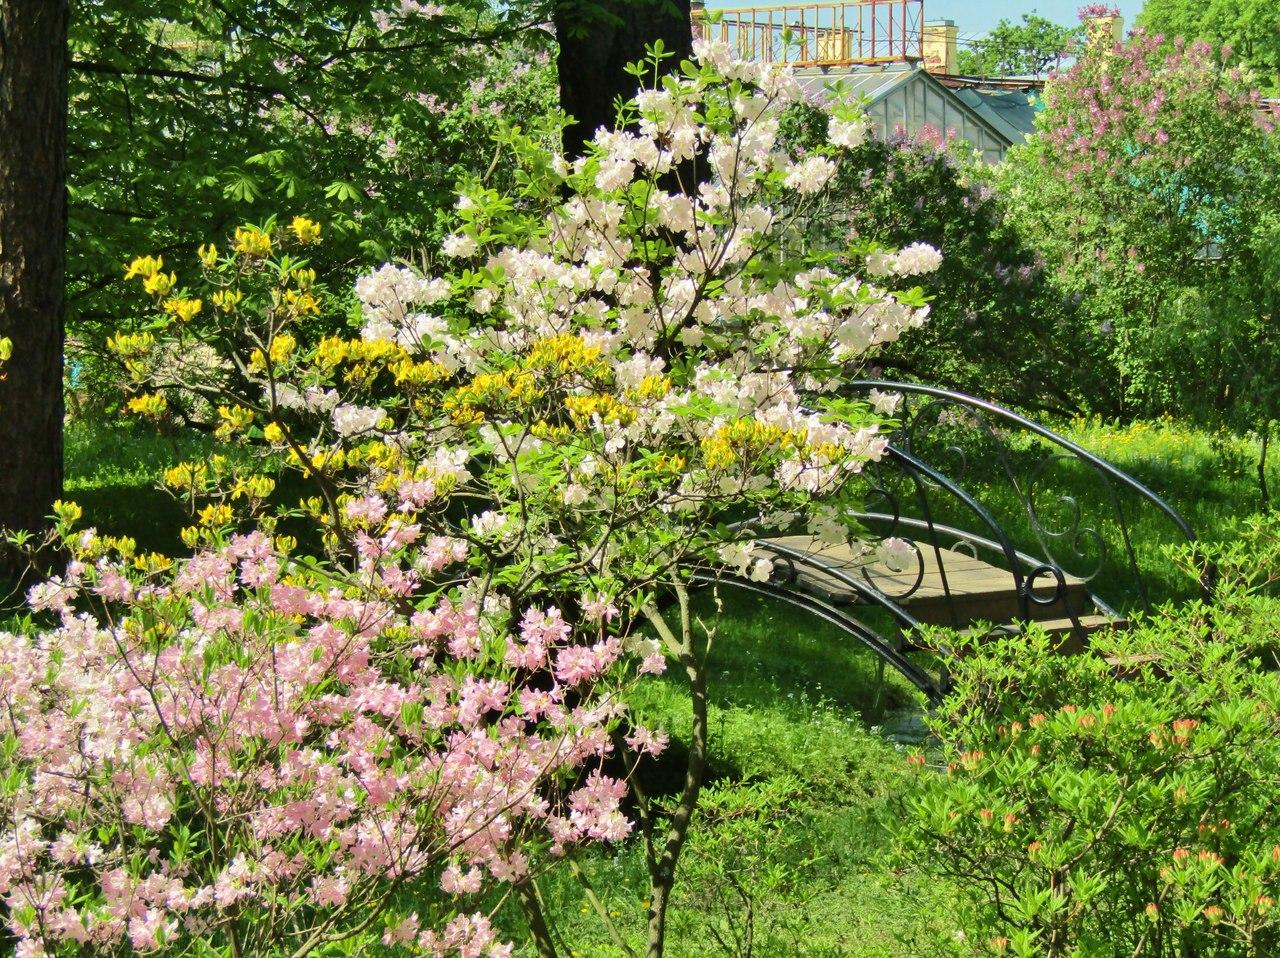 Ботанический сад, Санкт-Петербург. Фото: Галина Стурова